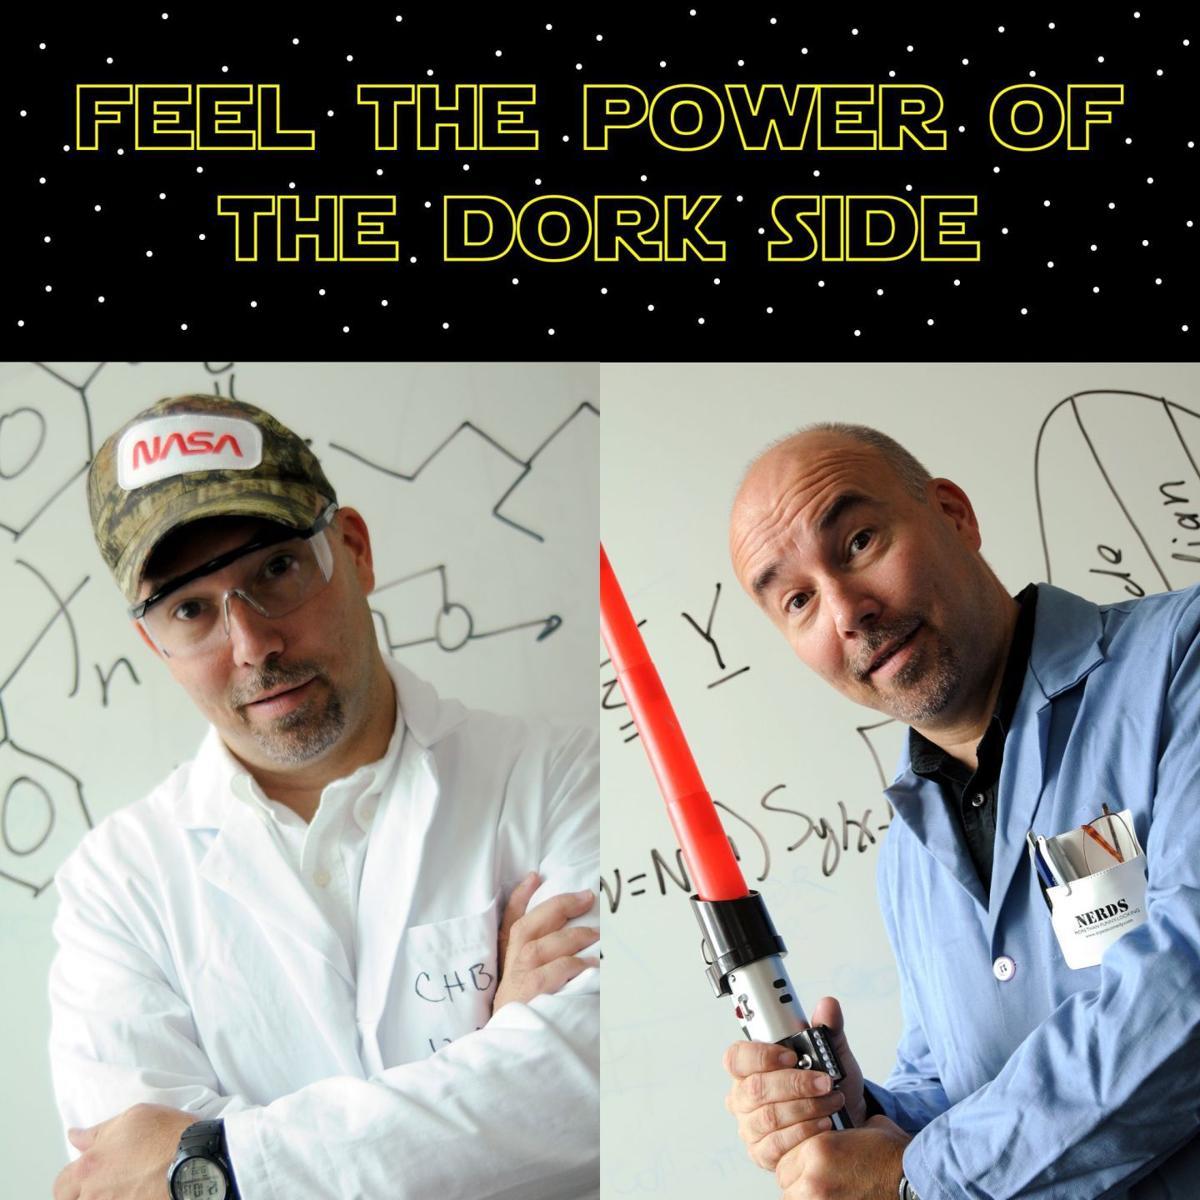 Feel the Power of the Dork Side — Steinhouse Warehouse Community Arts Center